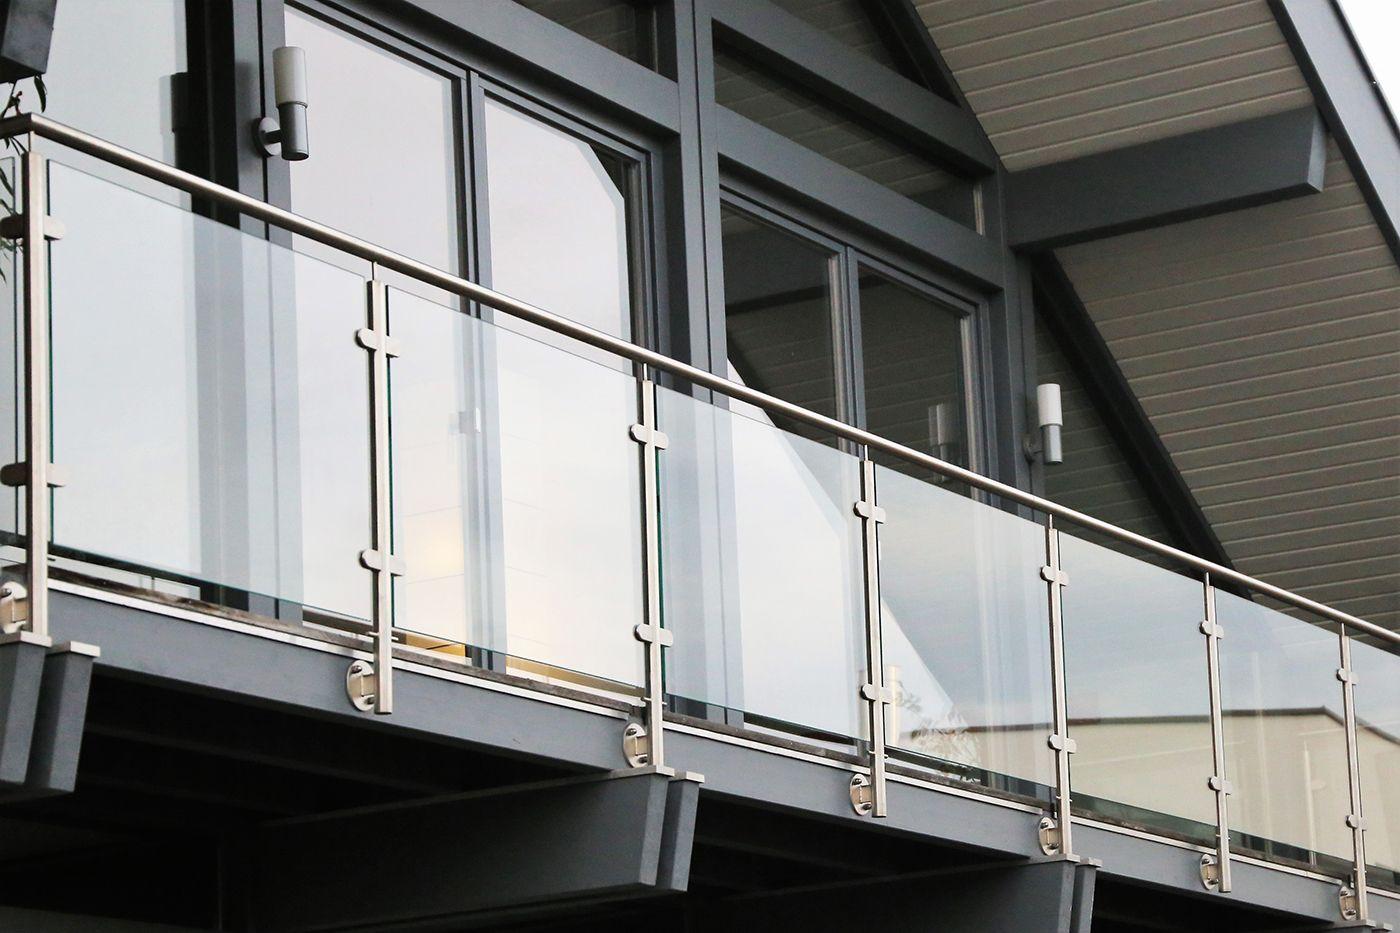 Glass Balcony Balustrade Balcone Moderno Balconi Vetrate